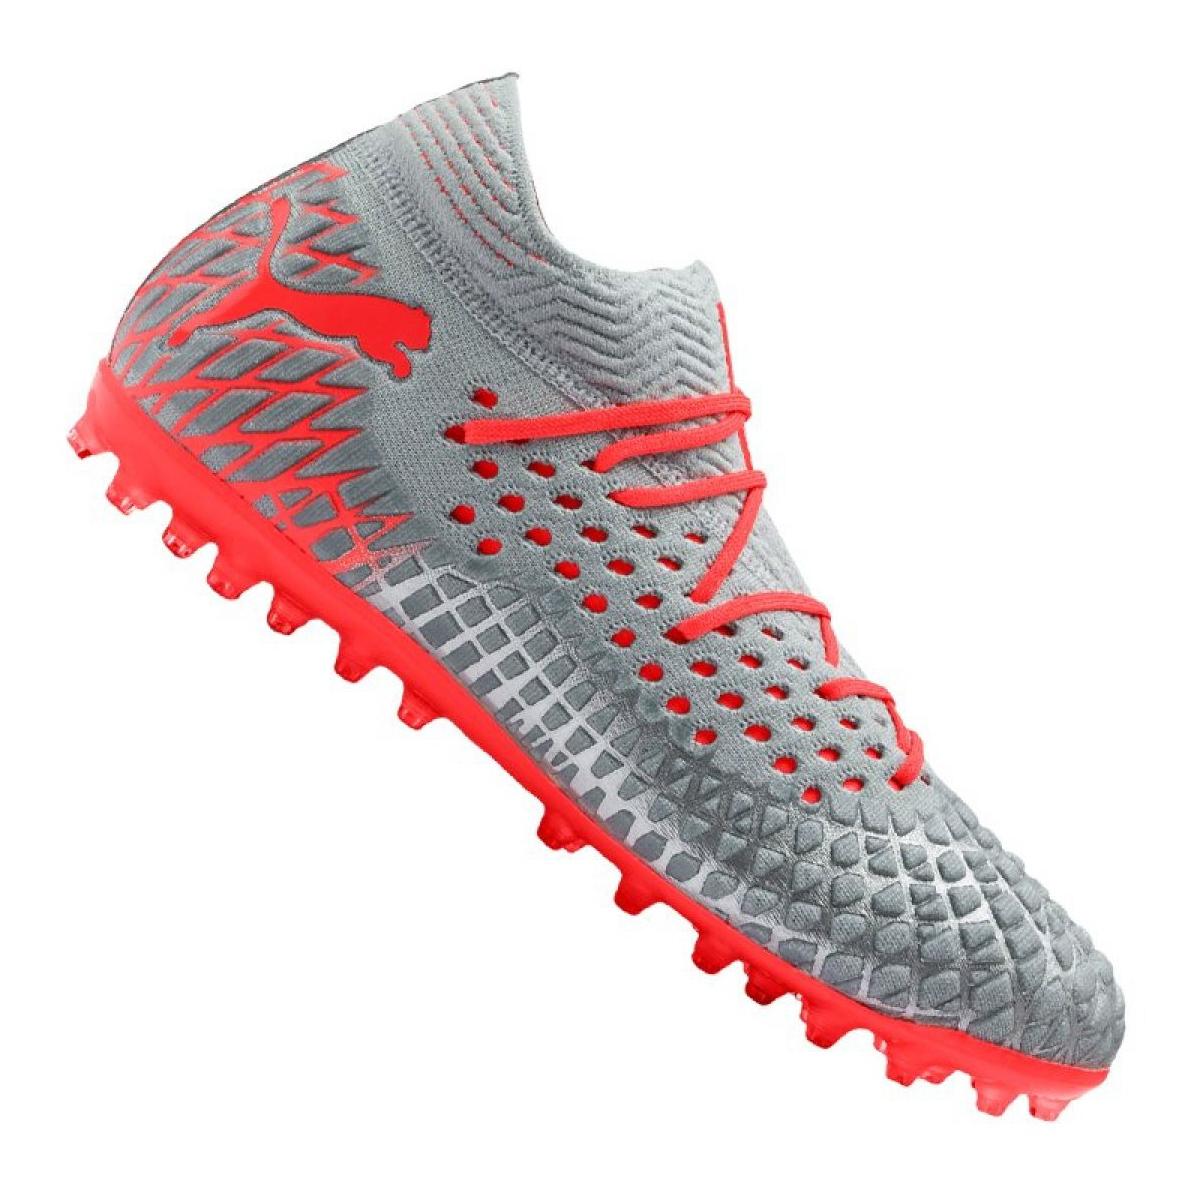 Details About Football Boots Puma Future 4 1 Netfit Mg M 105678 01